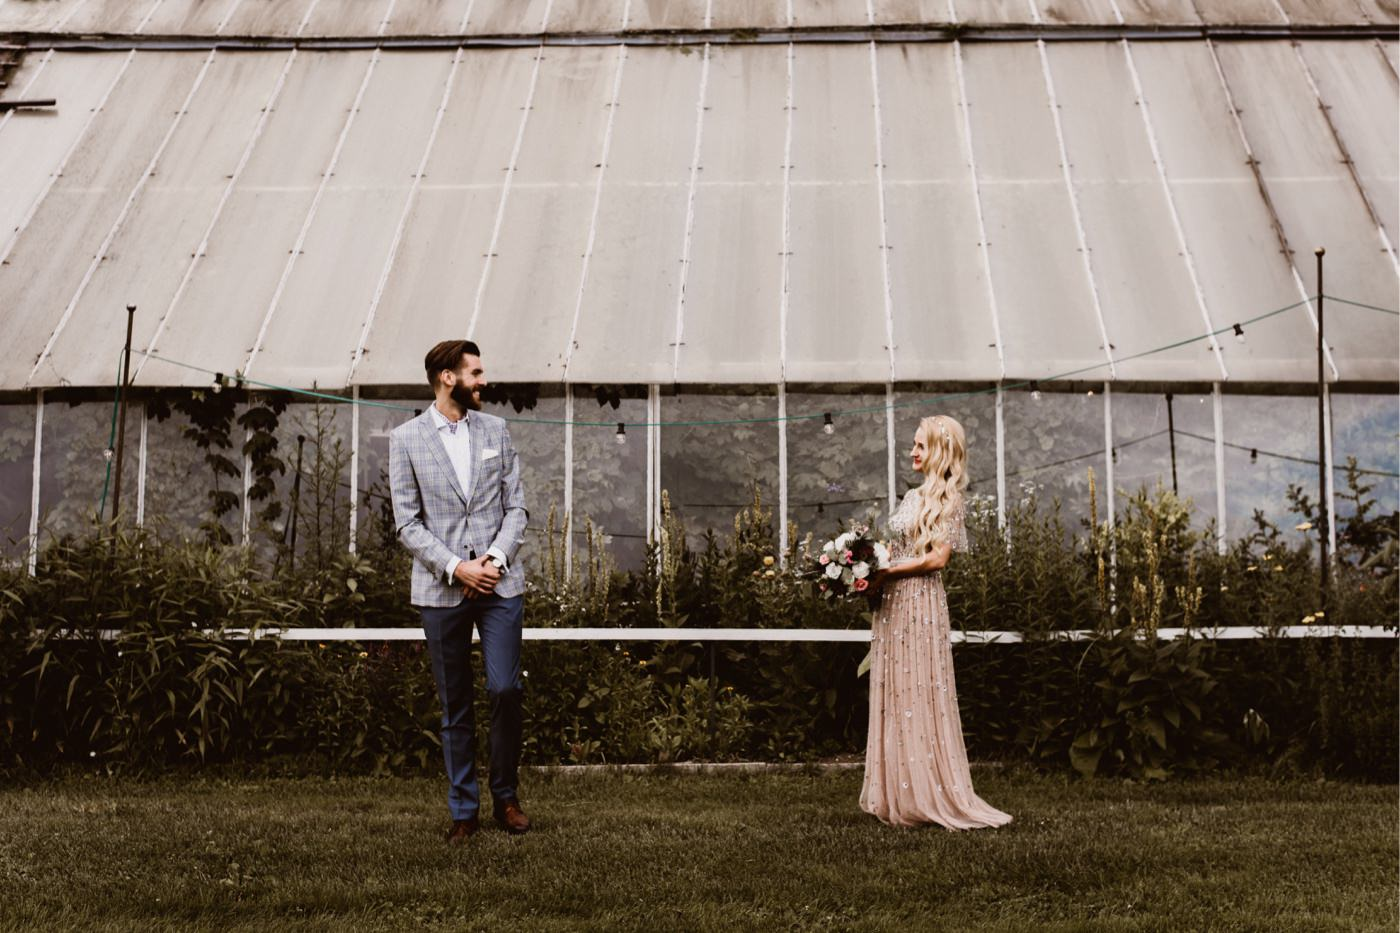 ewelina zieba rustykalne wesele stara oranzeria warszawa 028